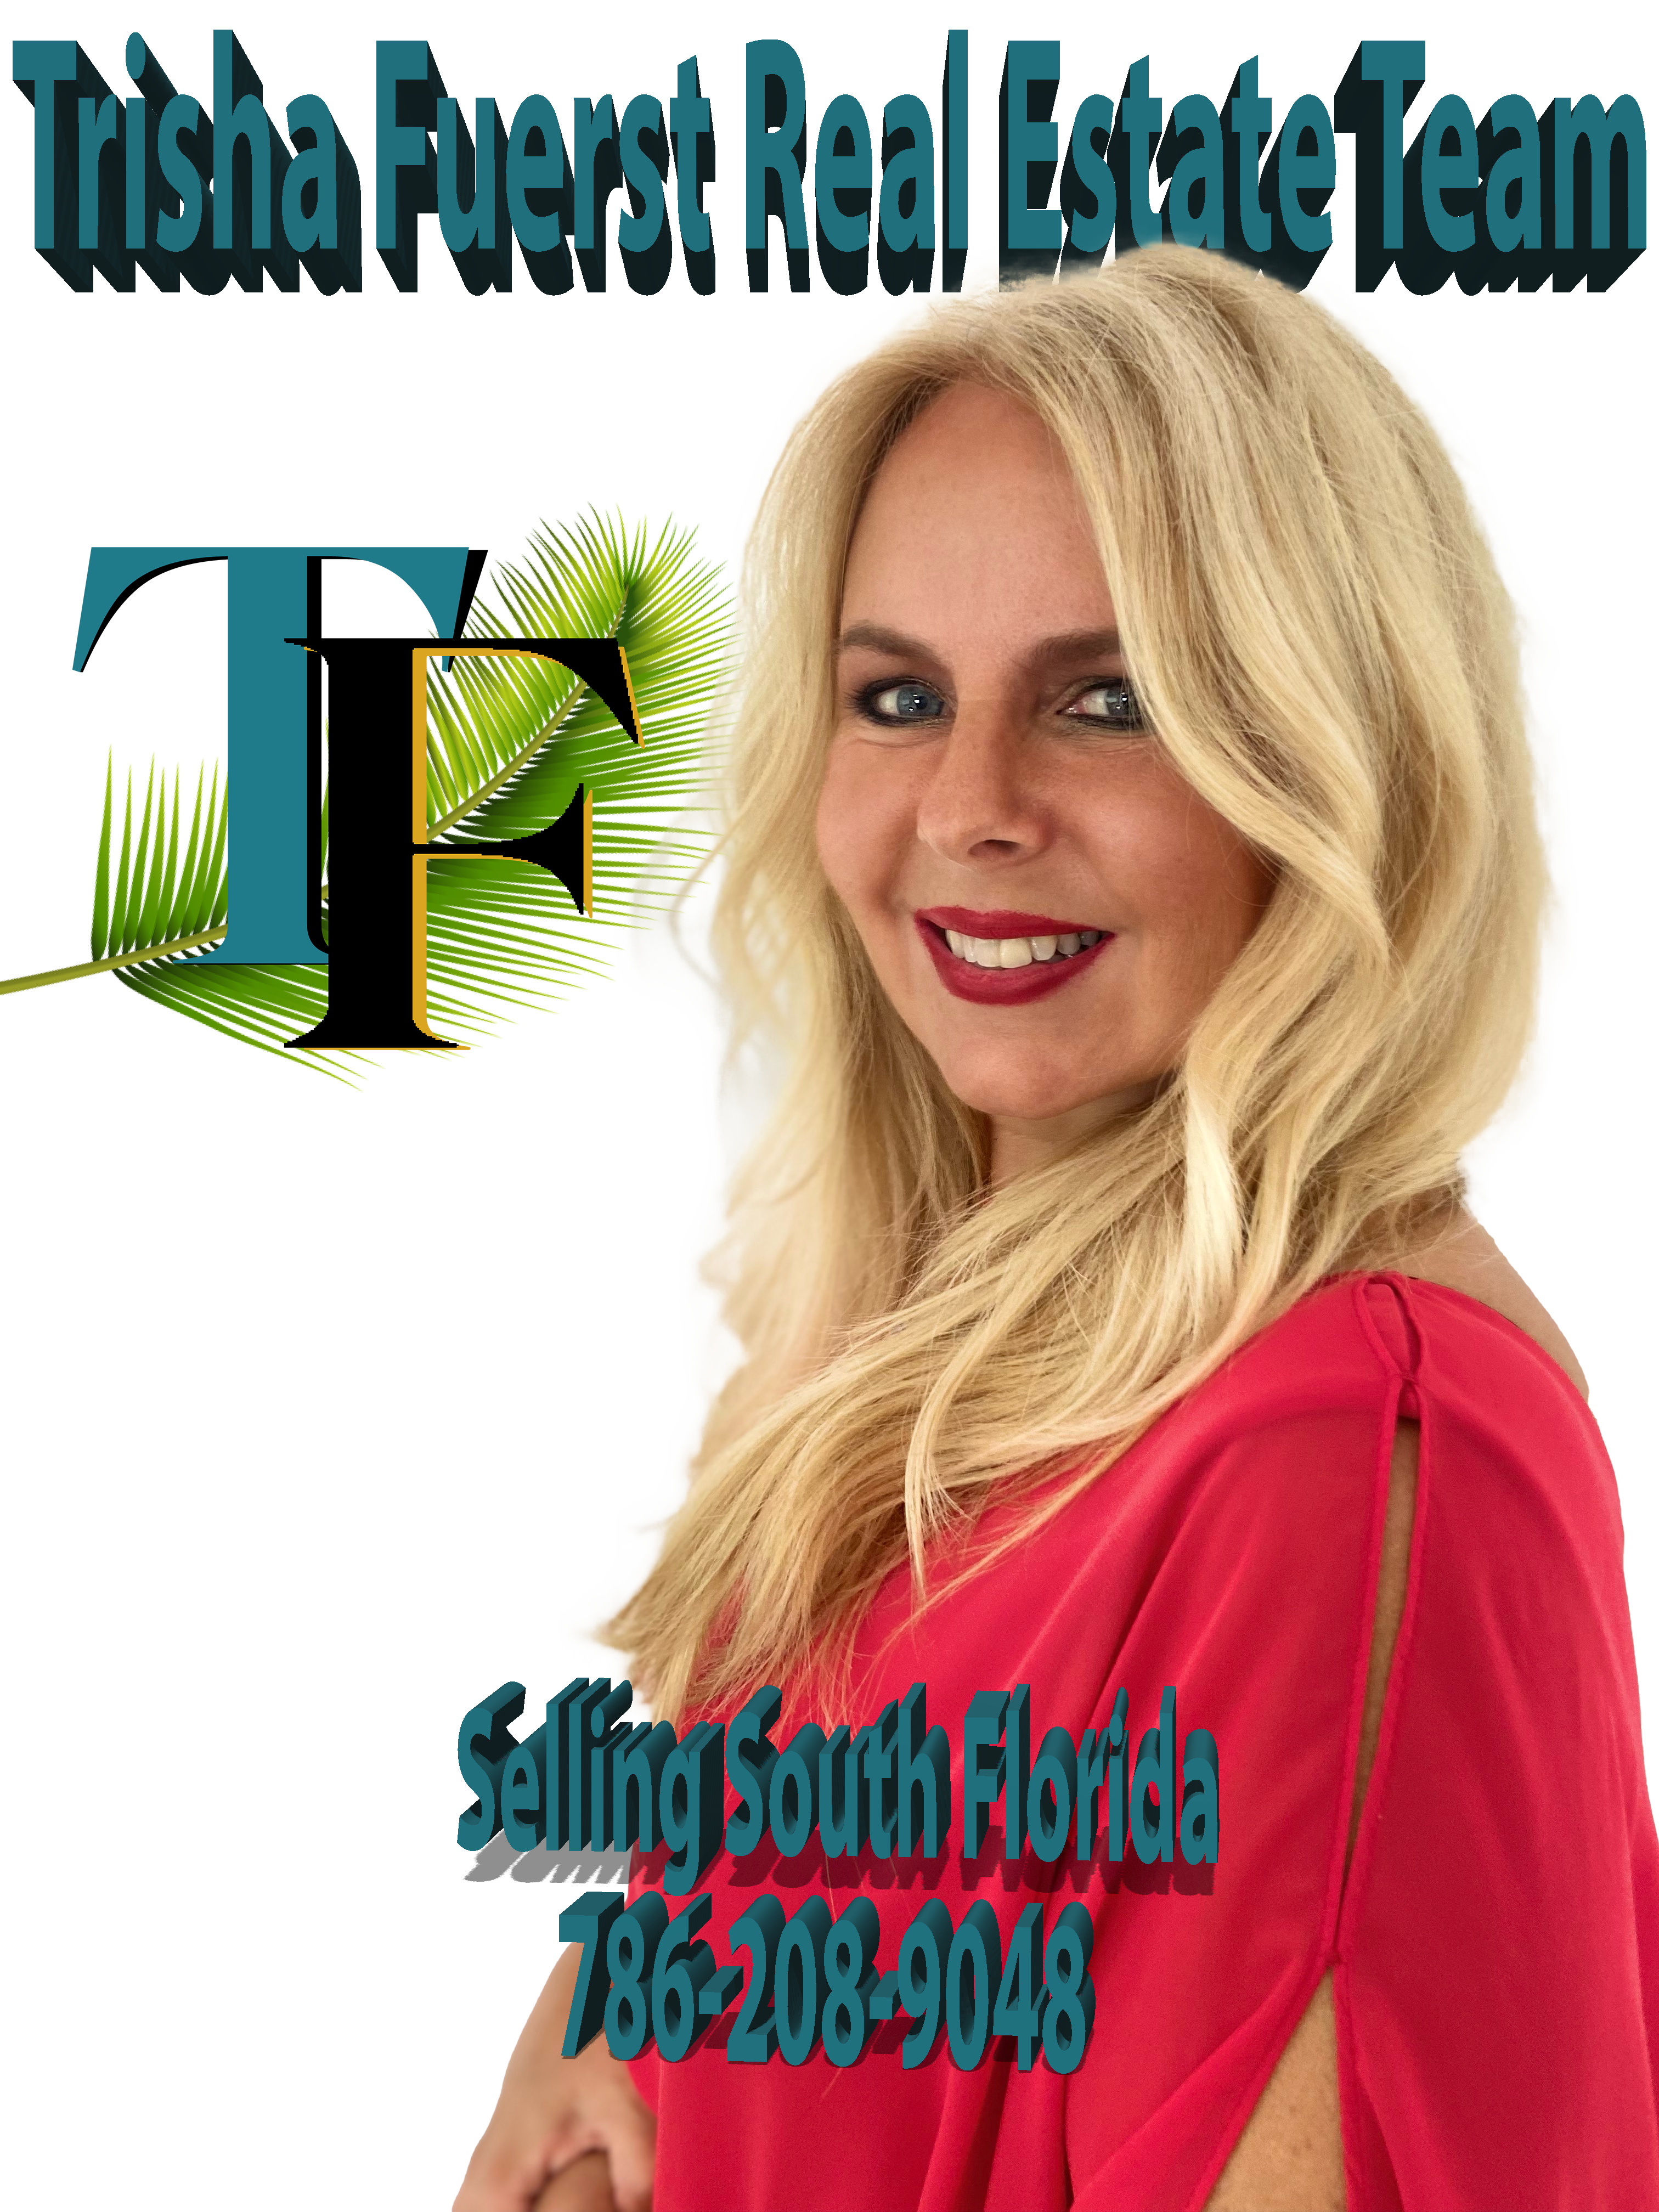 Trisha Fuerst Team<br><i>Selling South Florida</i>